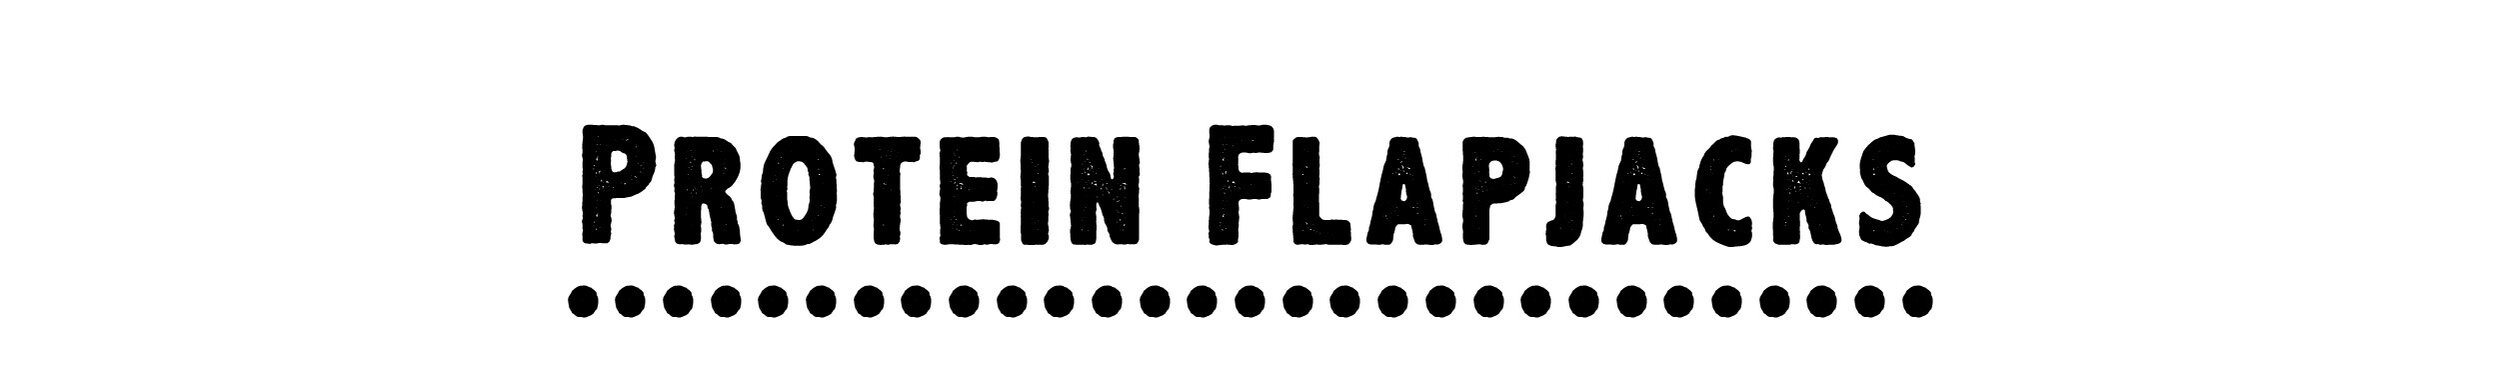 LMPP Built Flapjack.jpg